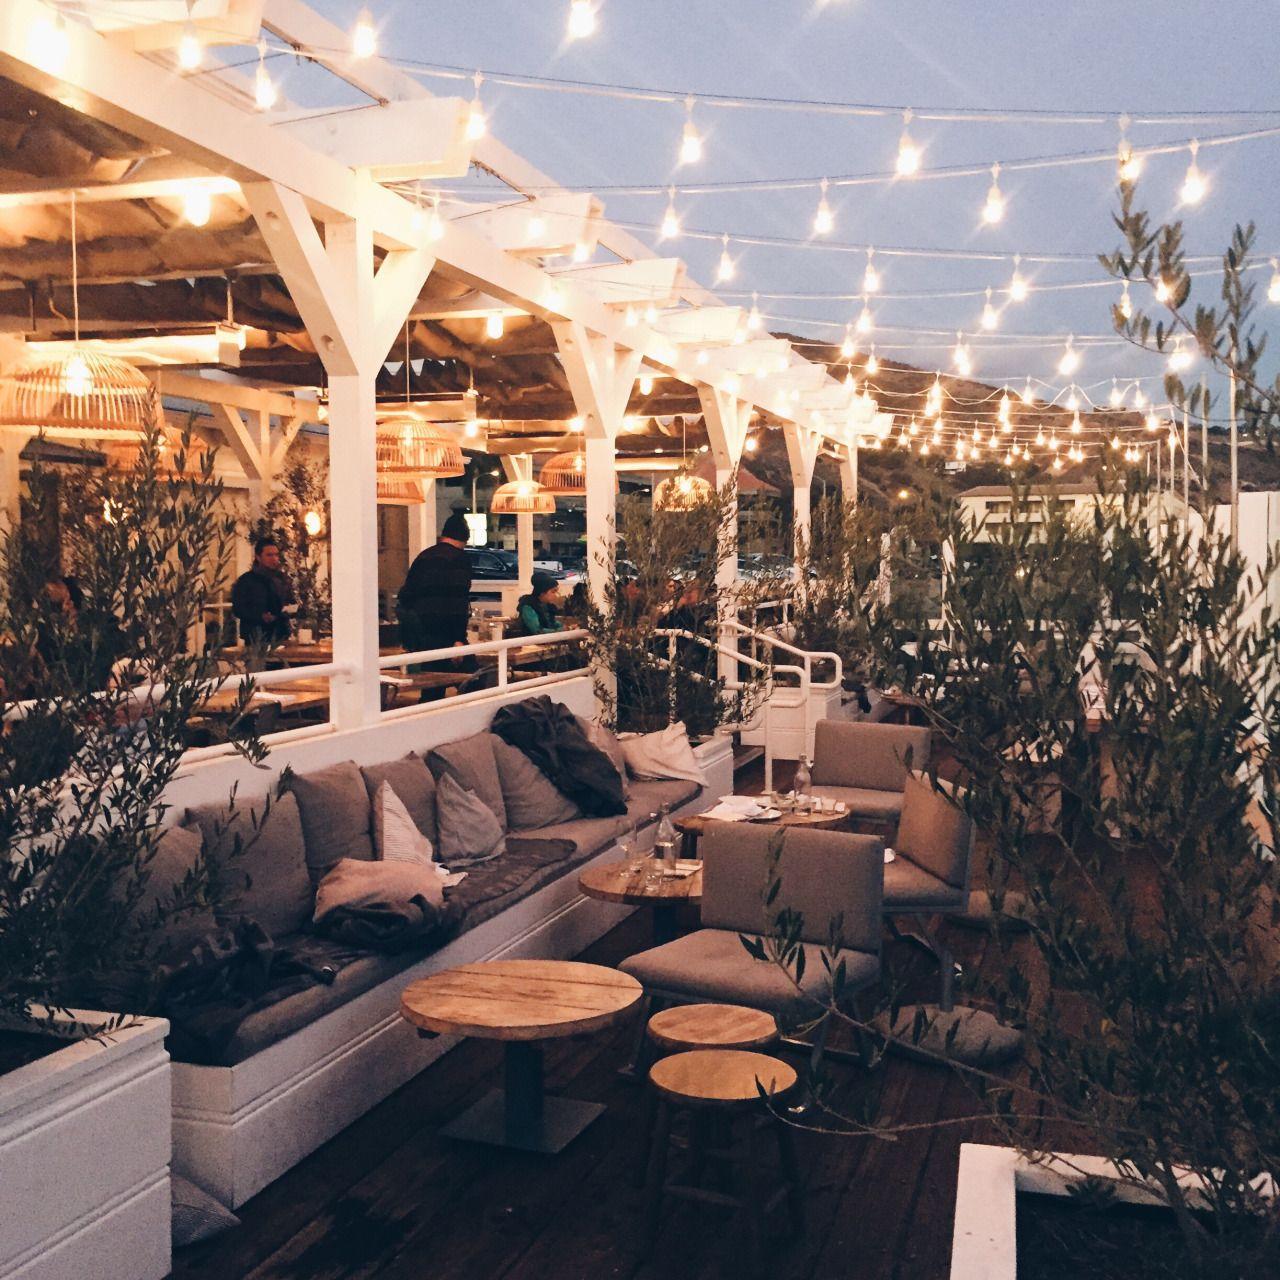 liveloveevintage Backyard RestaurantBackyard CafeOutdoor Restaurant DesignBohemian